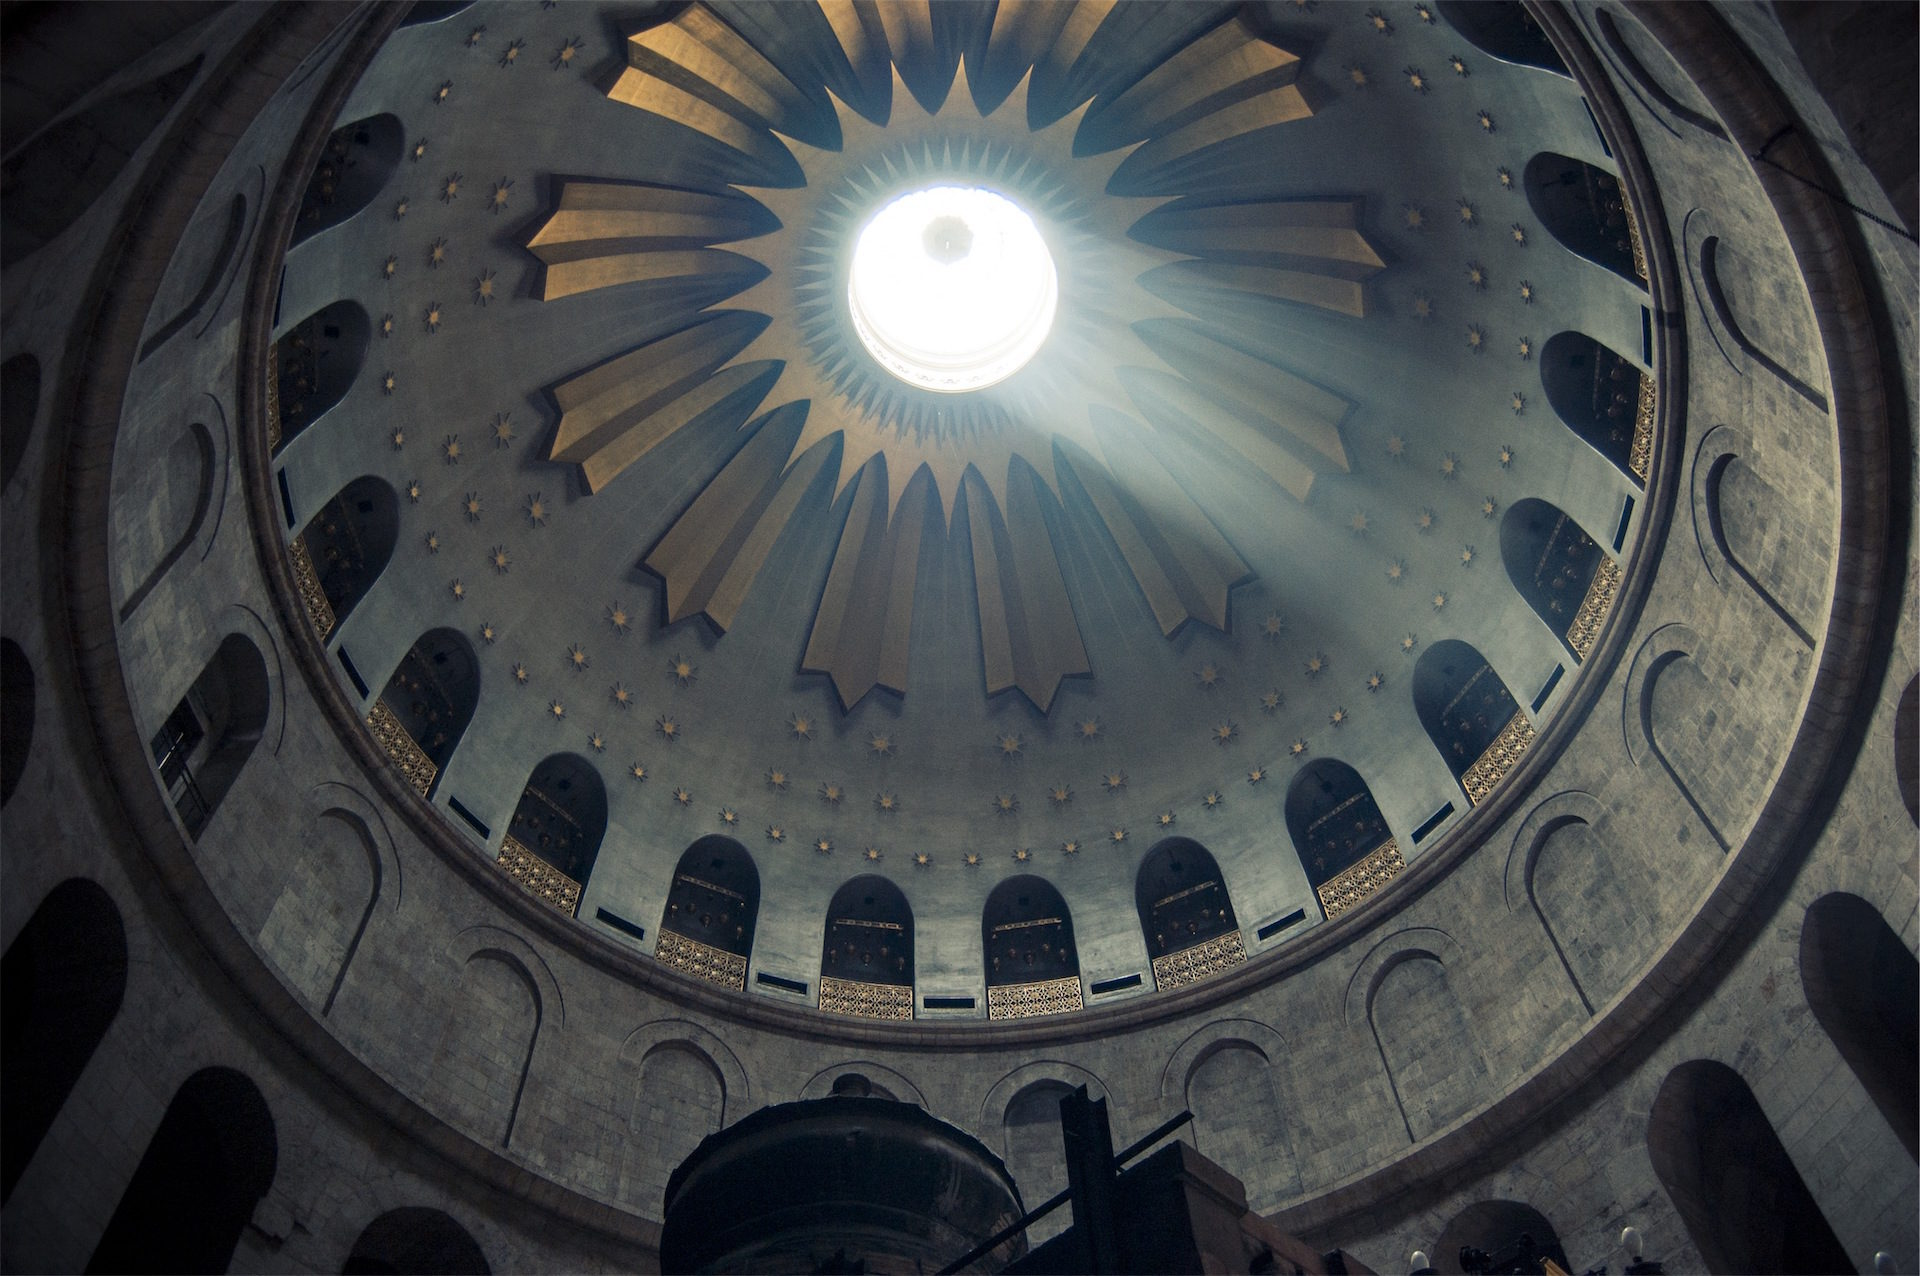 cúpula, 教会, tempo, 光, halo - 高清壁纸 - 教授-falken.com